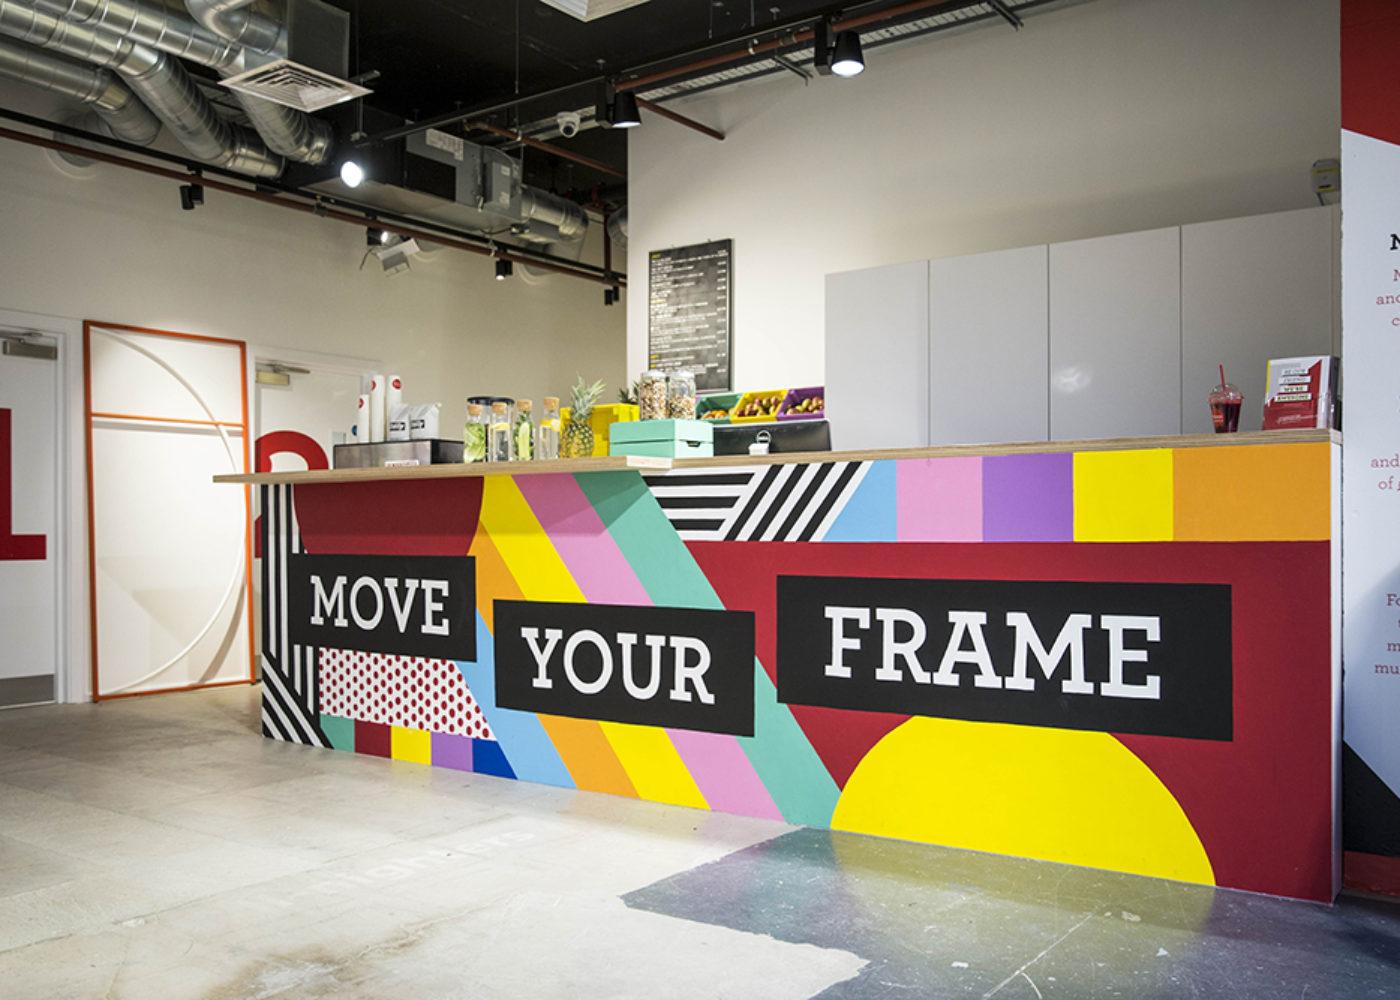 FRAME-03-21-16-Victoria-Studio-132